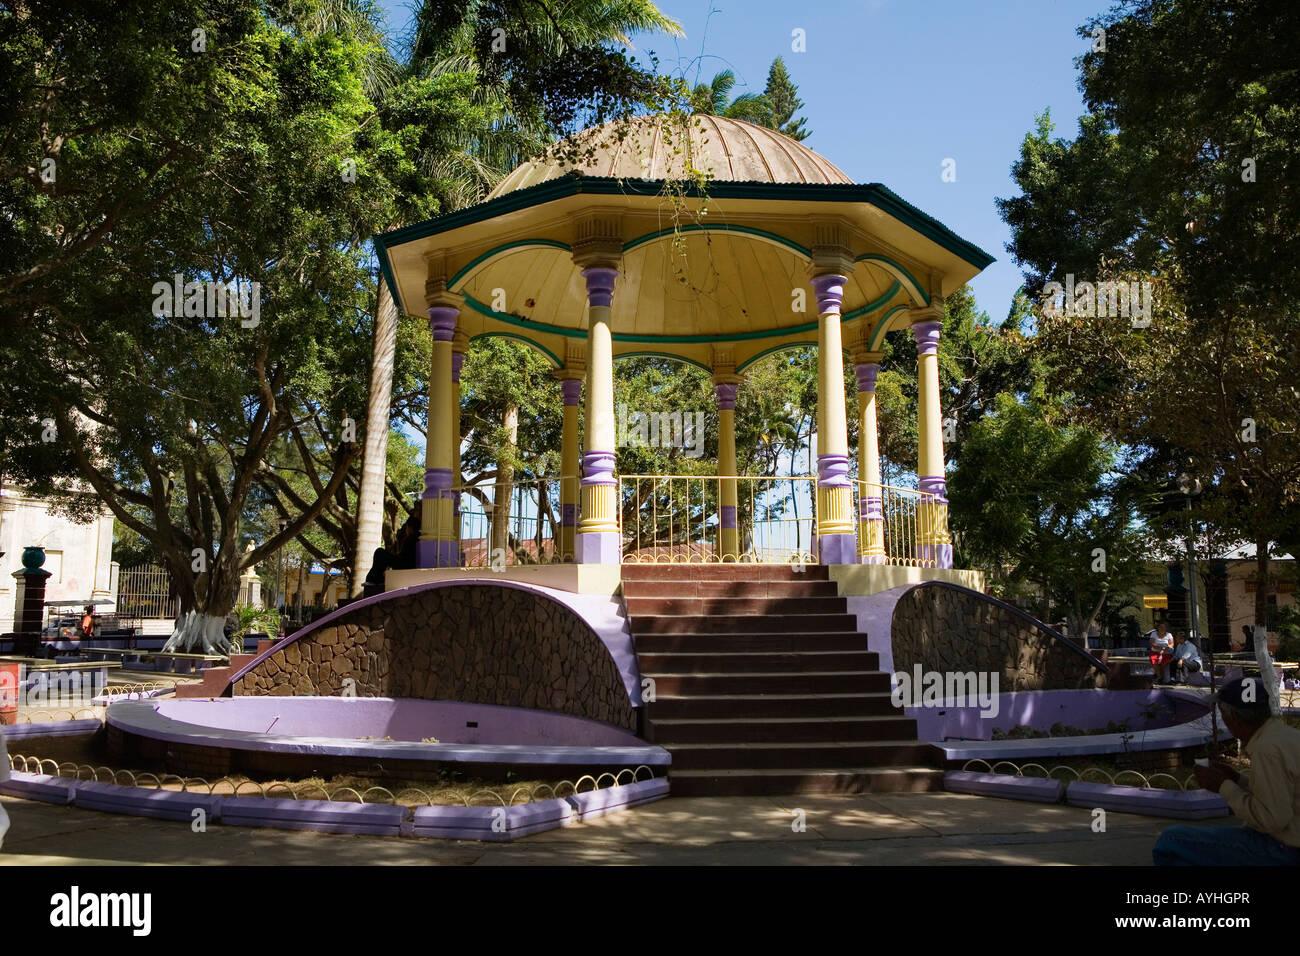 Bandstand gazebo central plaza square Jinotepe Nicaragua - Stock Image